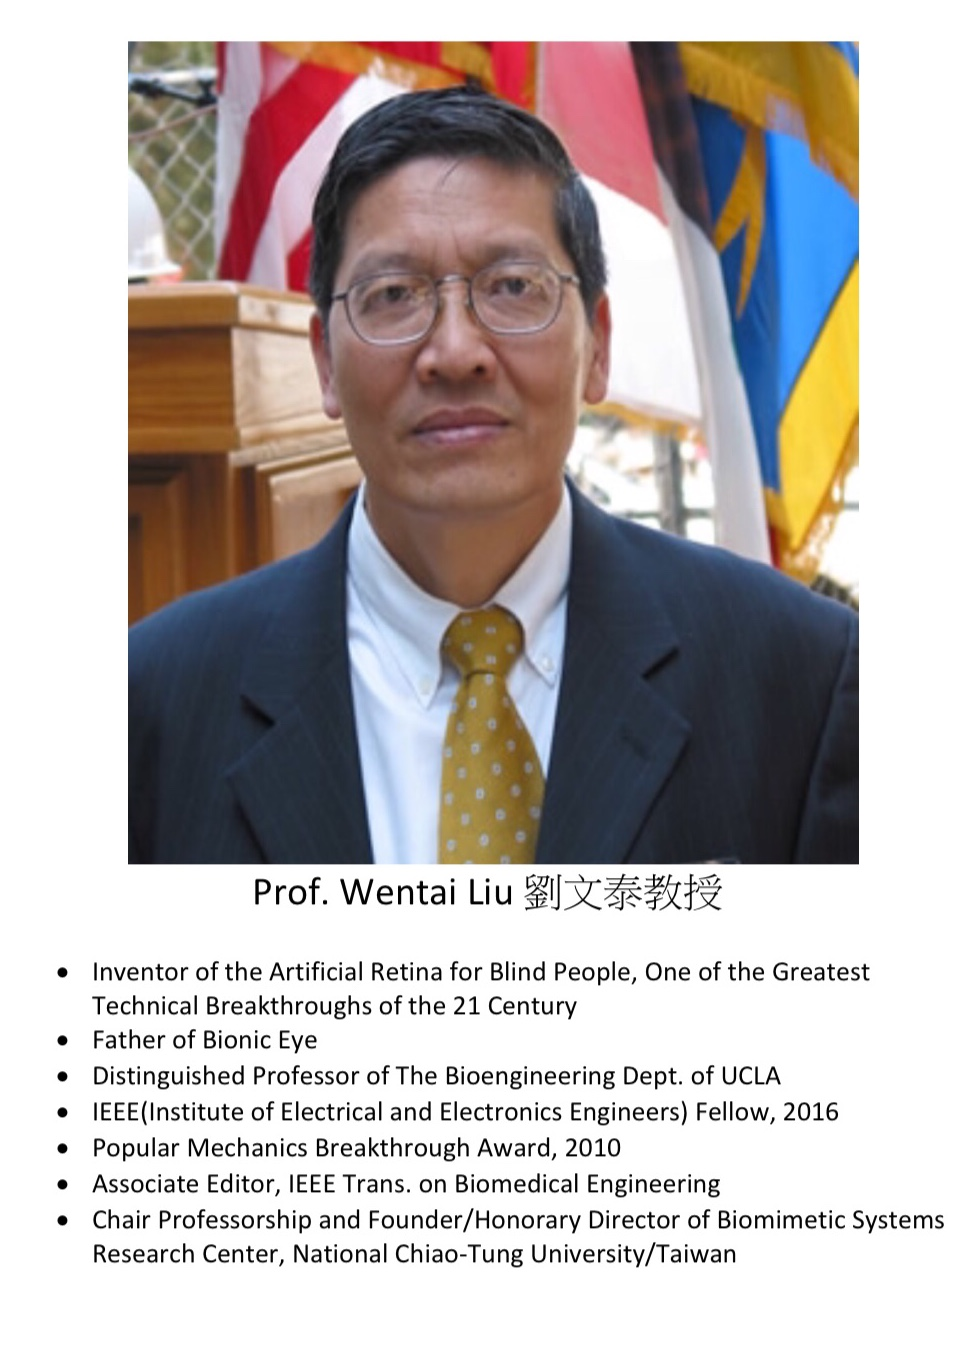 280. Prof. Wentai Liu 劉文泰教授